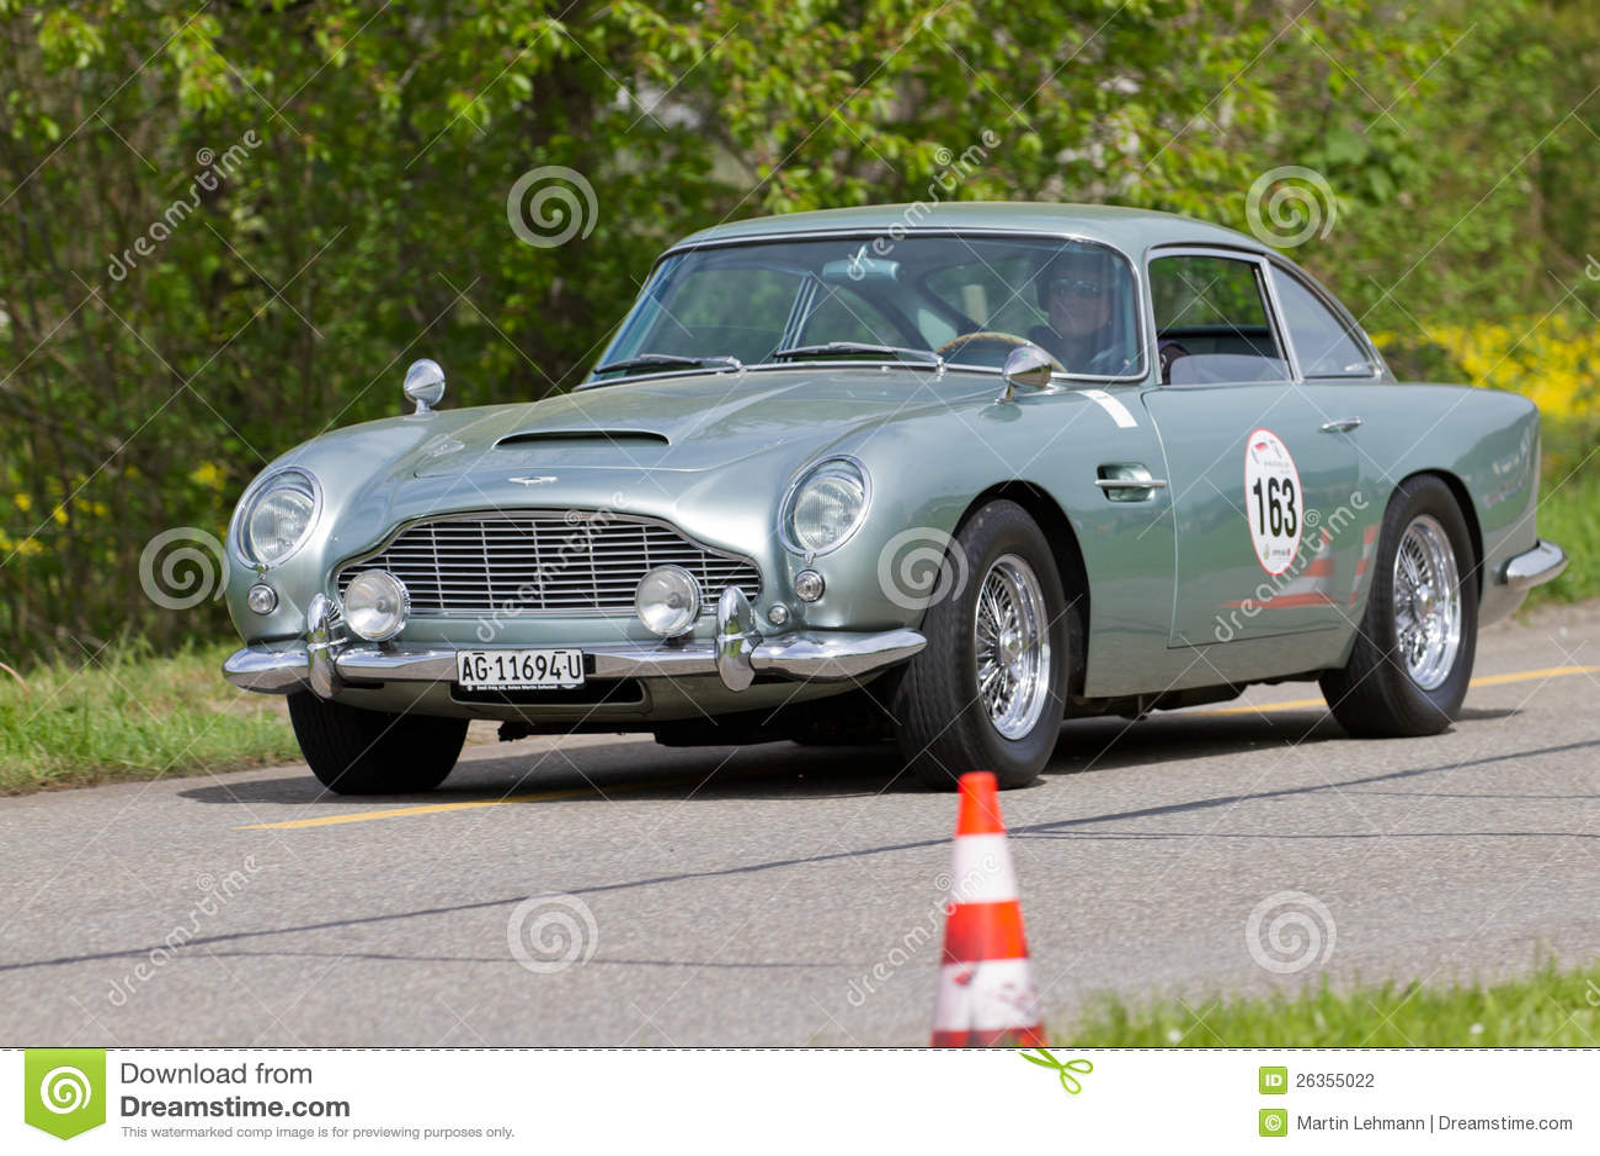 Vintage Aston Martin Db4 Vantage From 1962 Editorial Photography Image Of Historic Motorsport 26355022